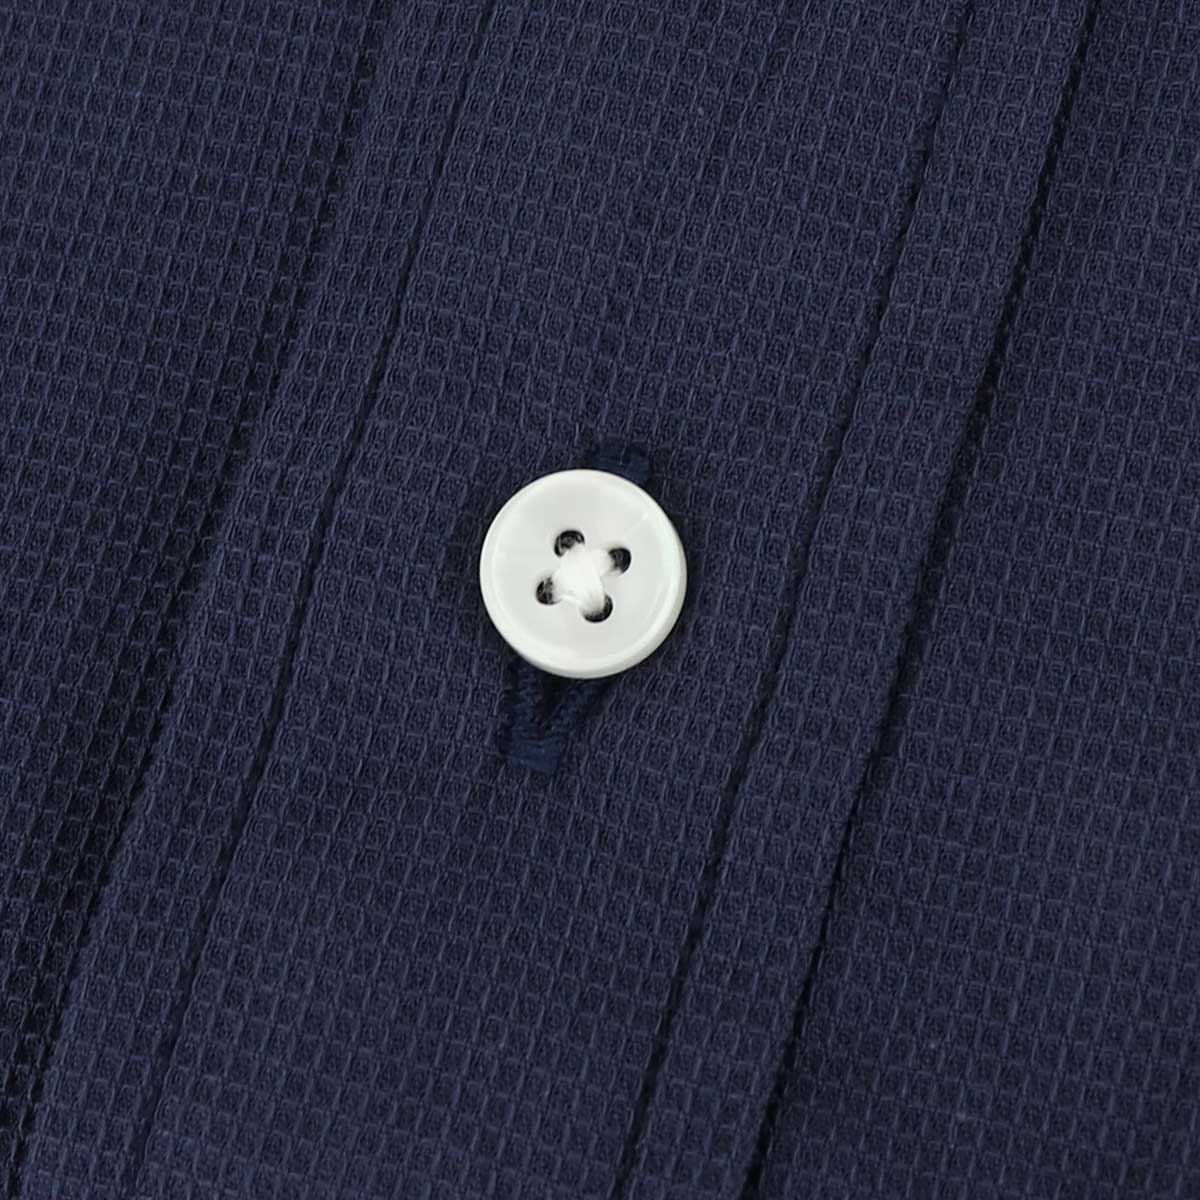 【50%OFF】サーフワッフル ボタンダウンシャツ(NAVY)